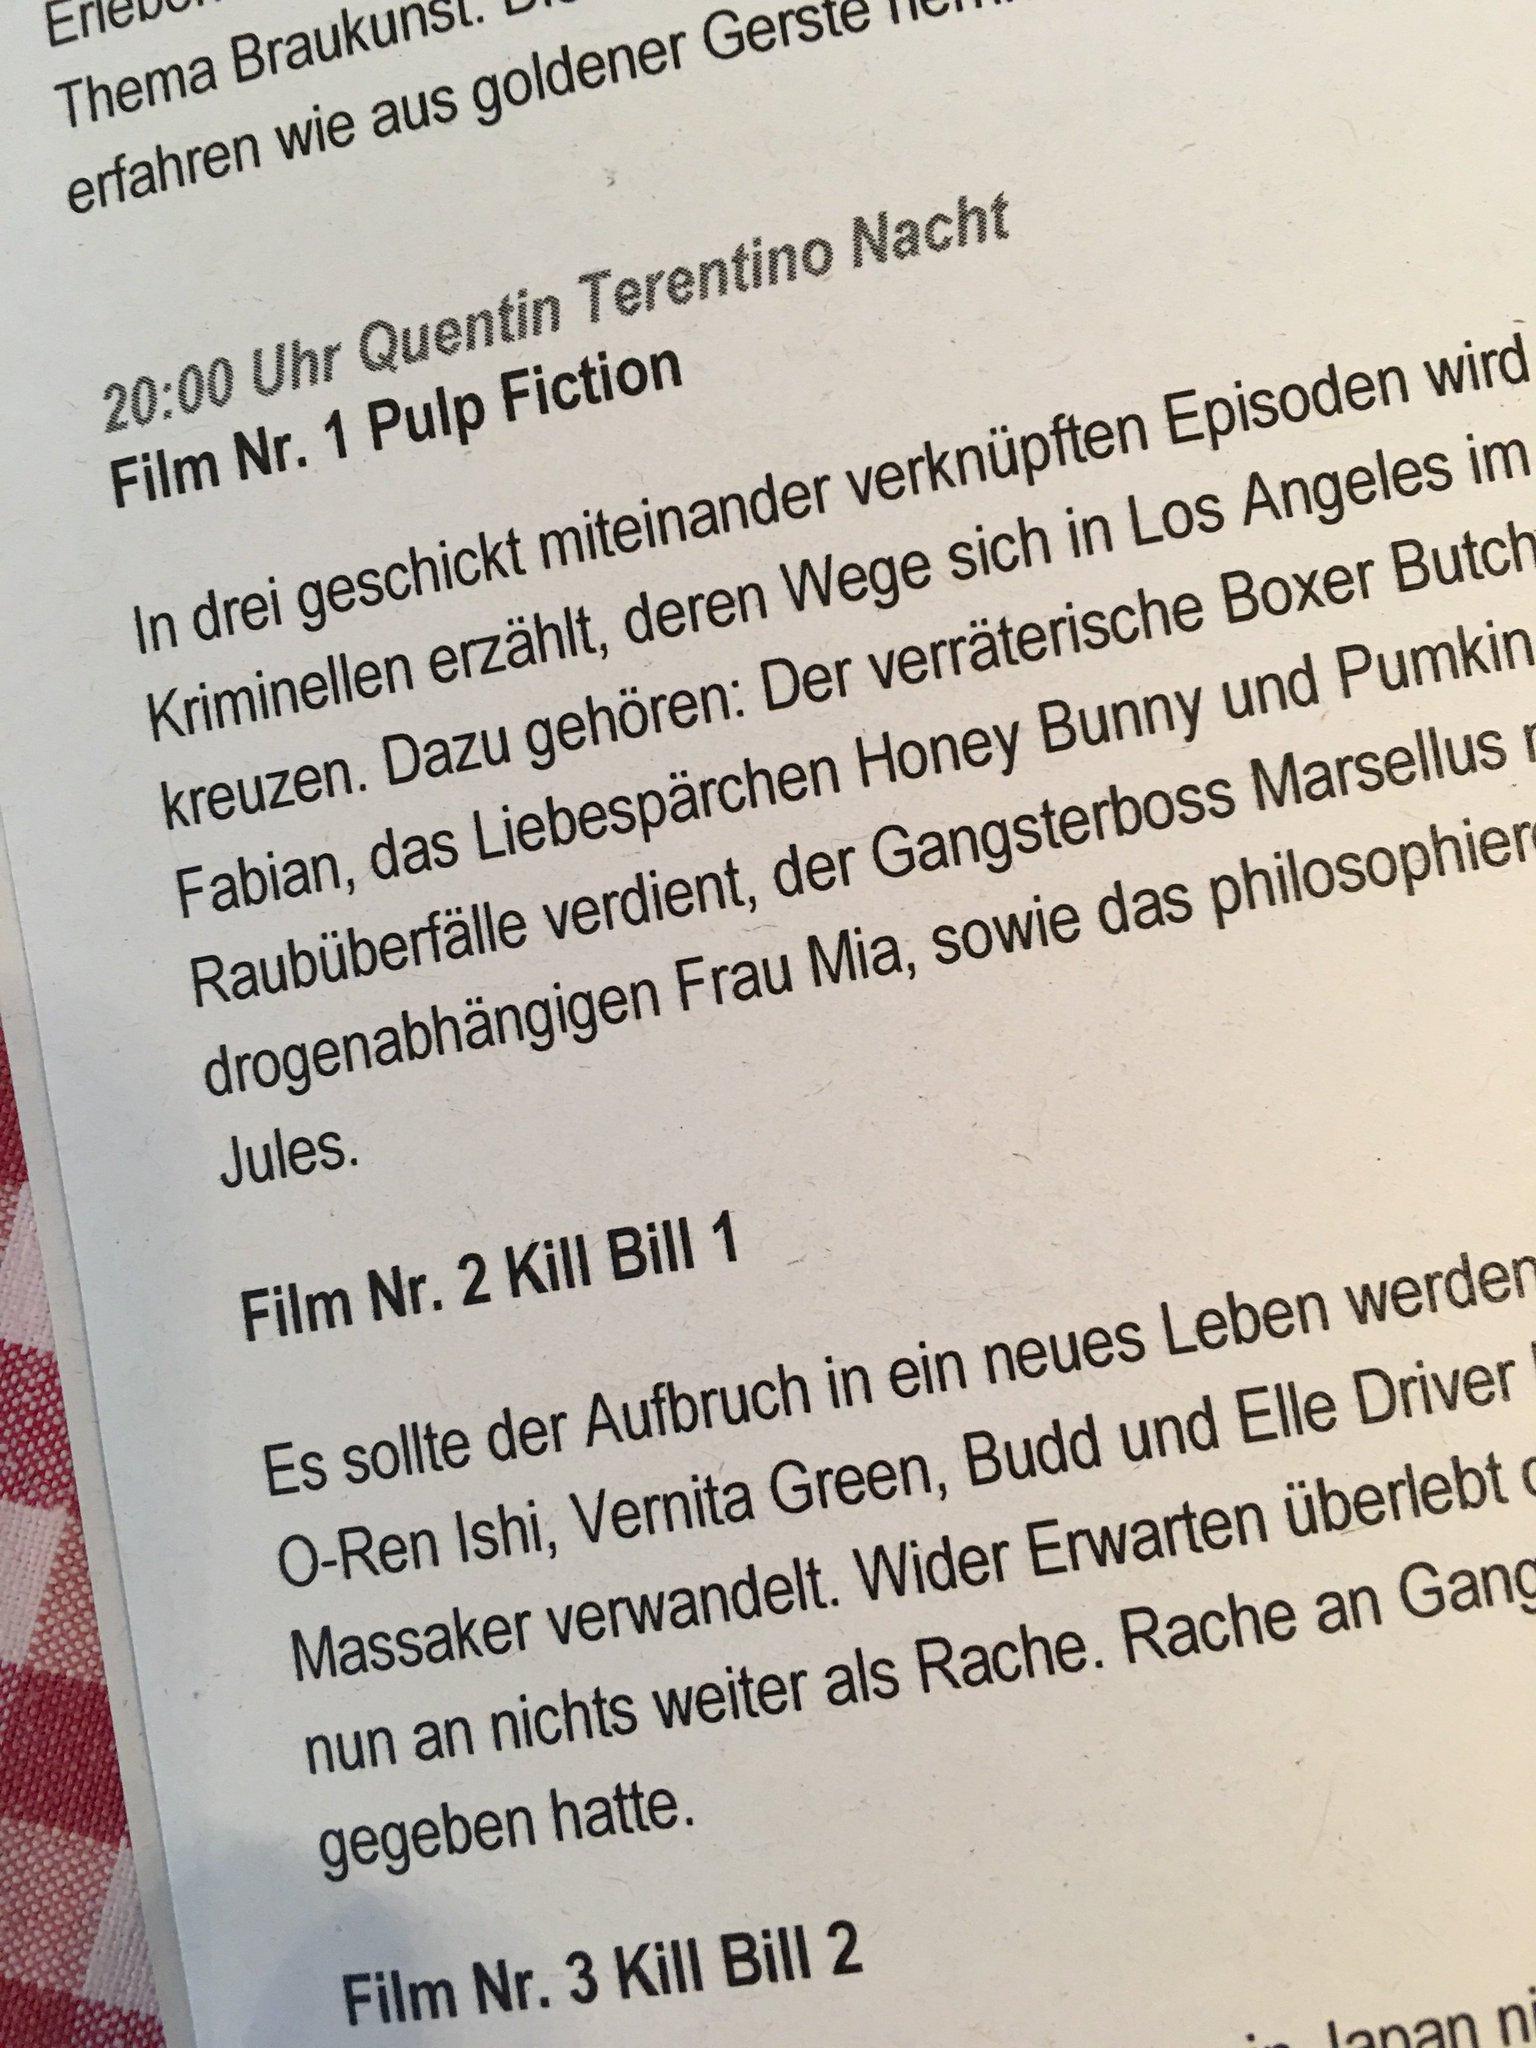 Heute ist Quentin Tarantino Nacht im Winterdorf #schmilka #saechsischeschweiz #meurers https://t.co/XrTJI0A44R